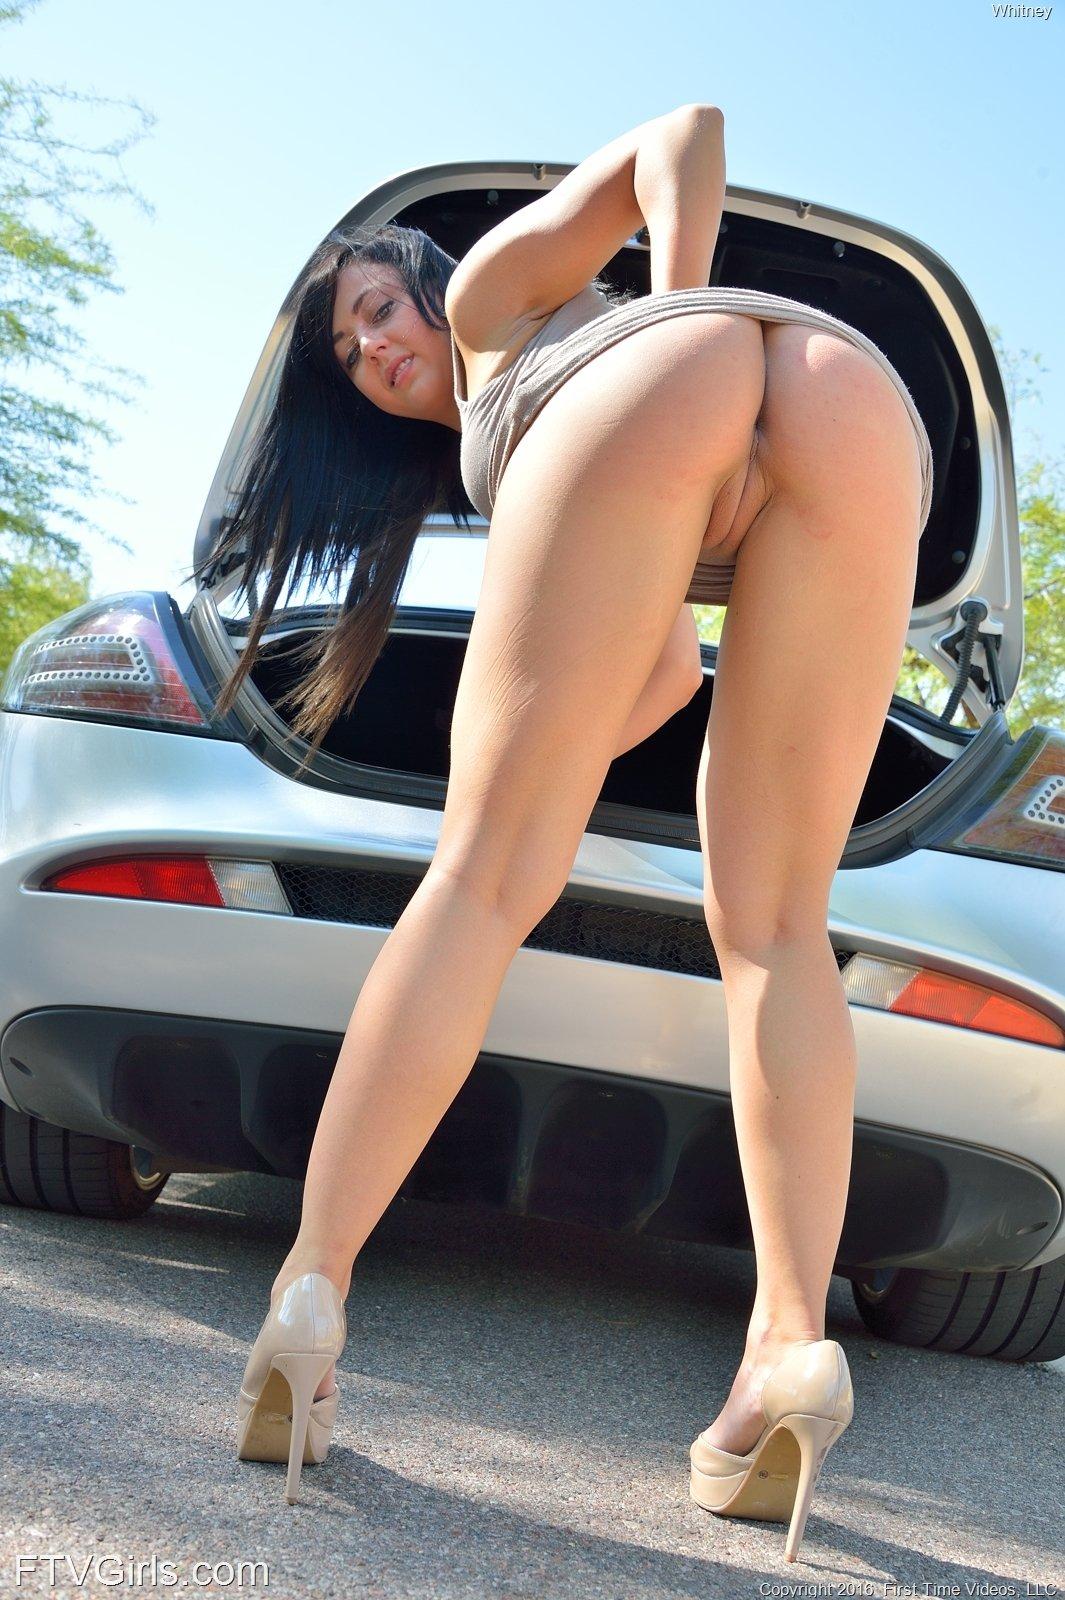 amazing nude girls bent over